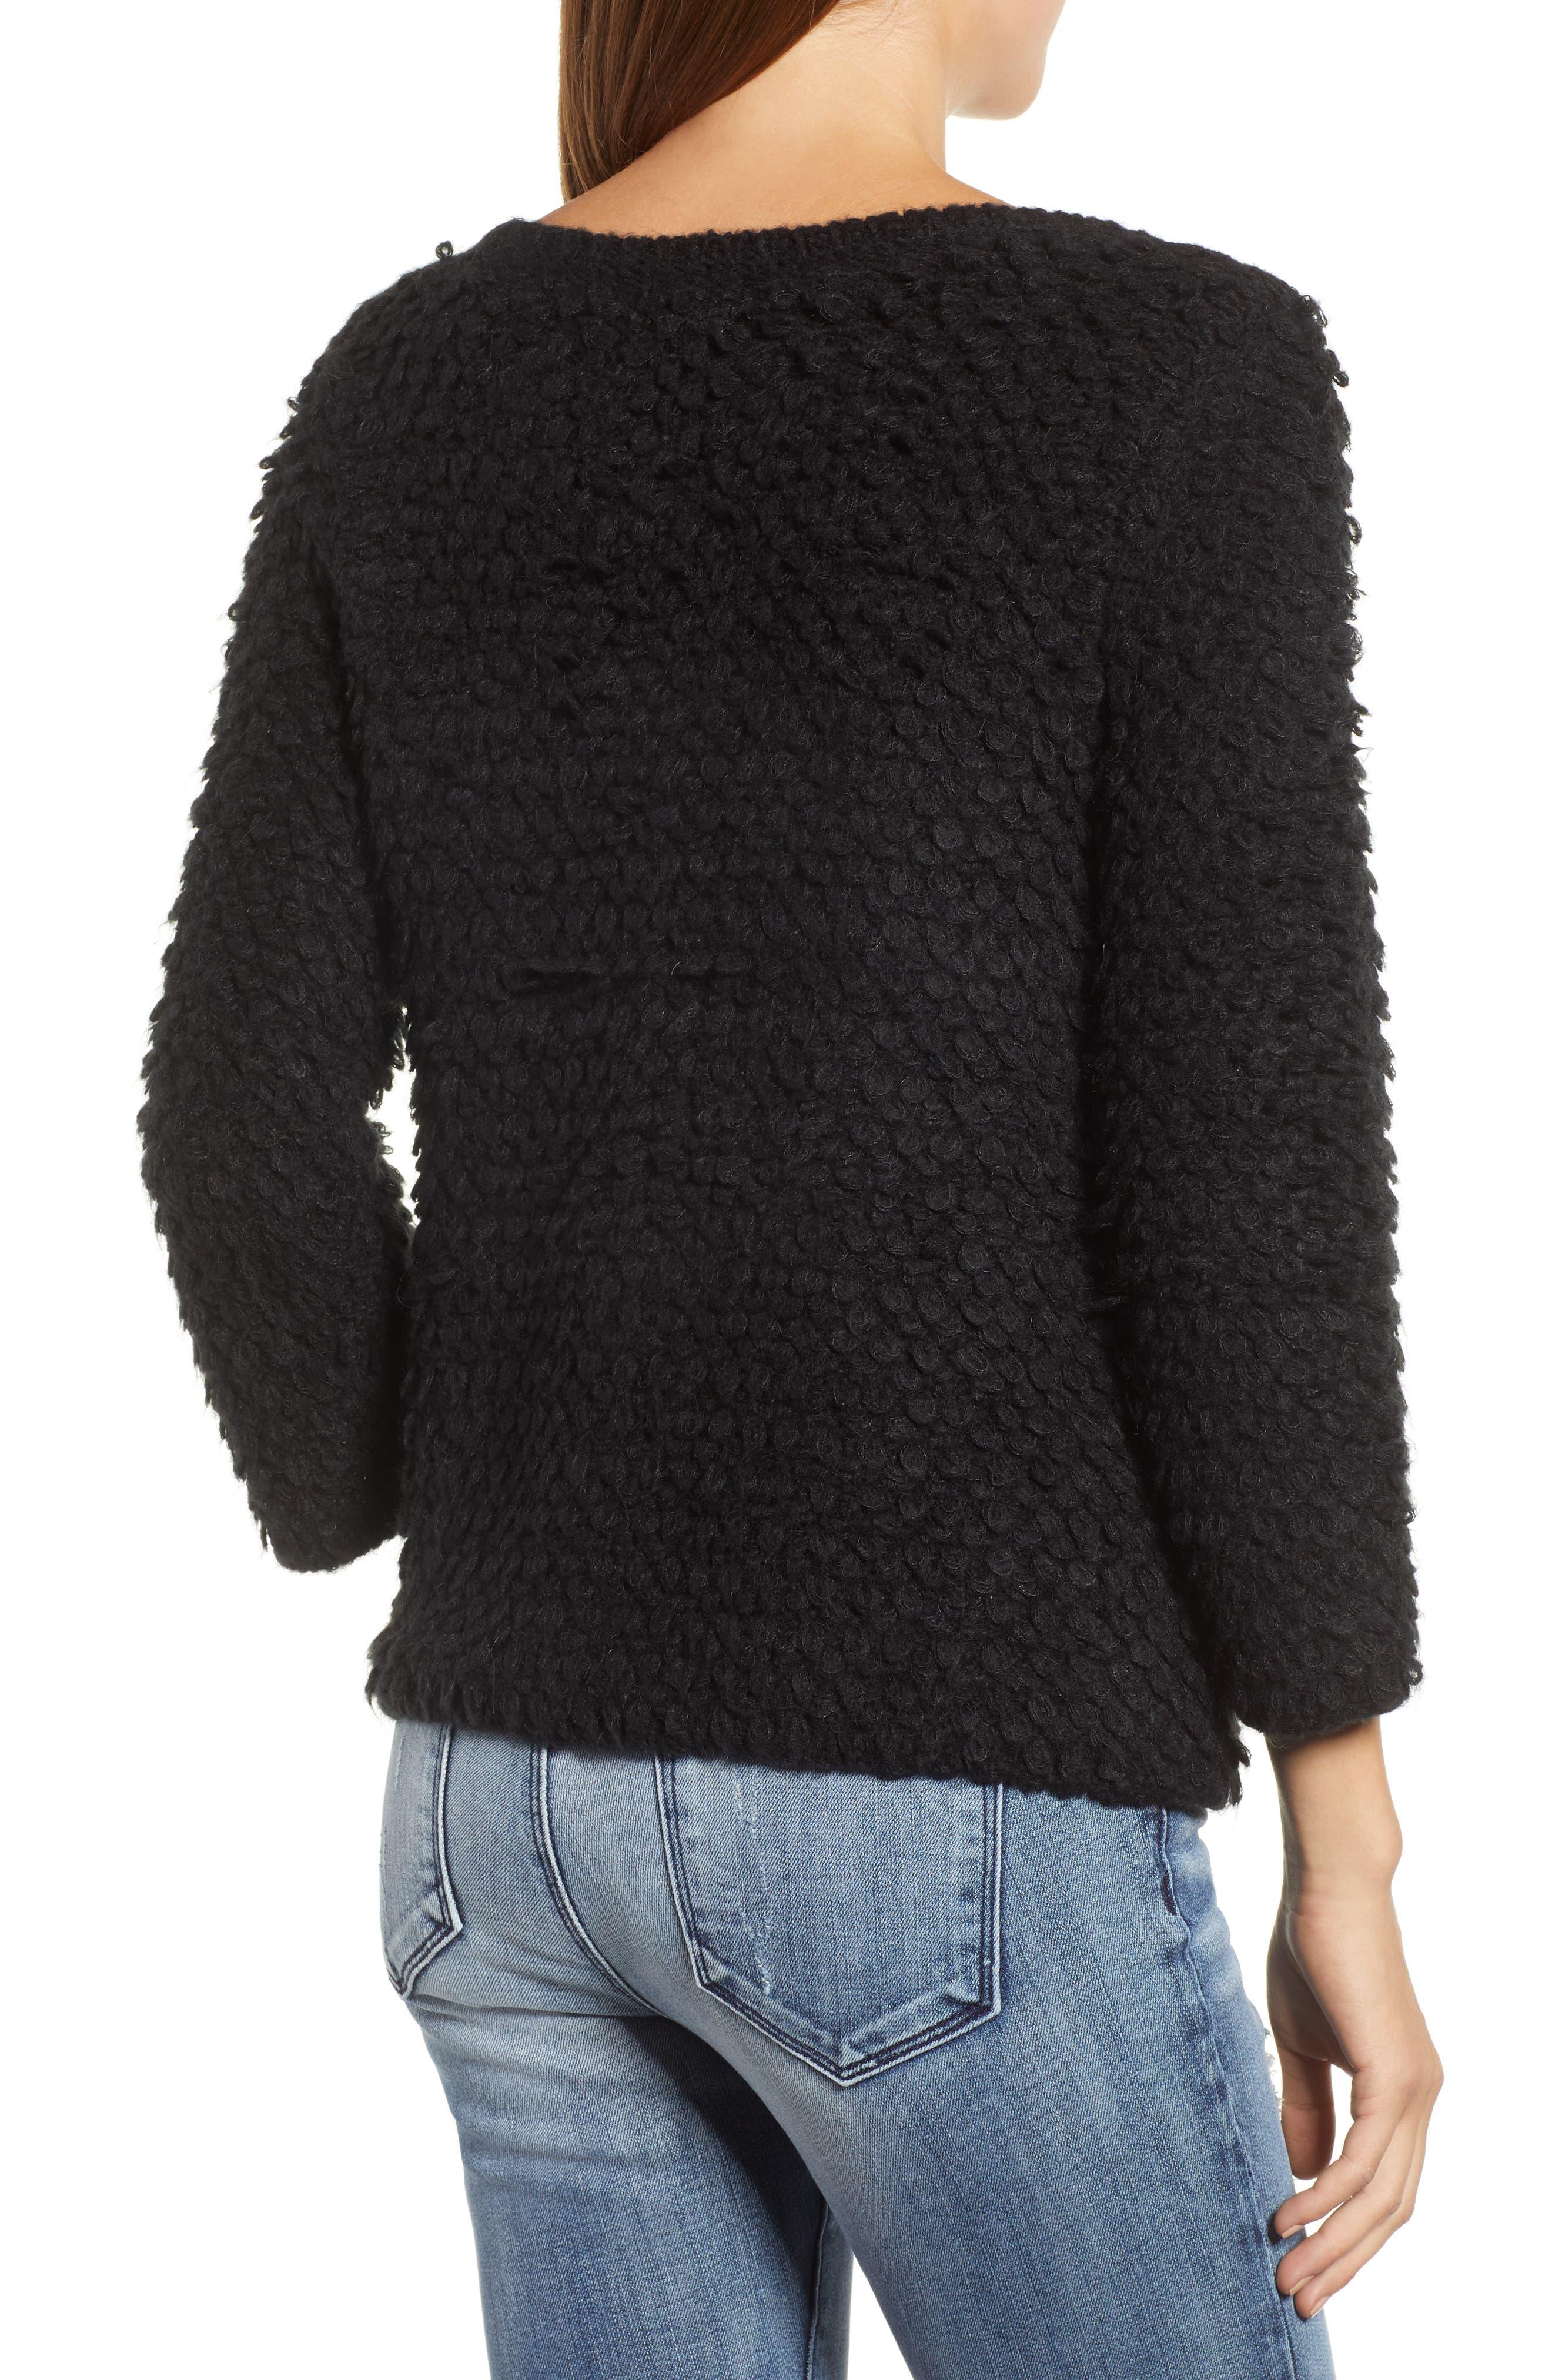 Loop Stitch Crewneck Sweater,                             Alternate thumbnail 2, color,                             Black